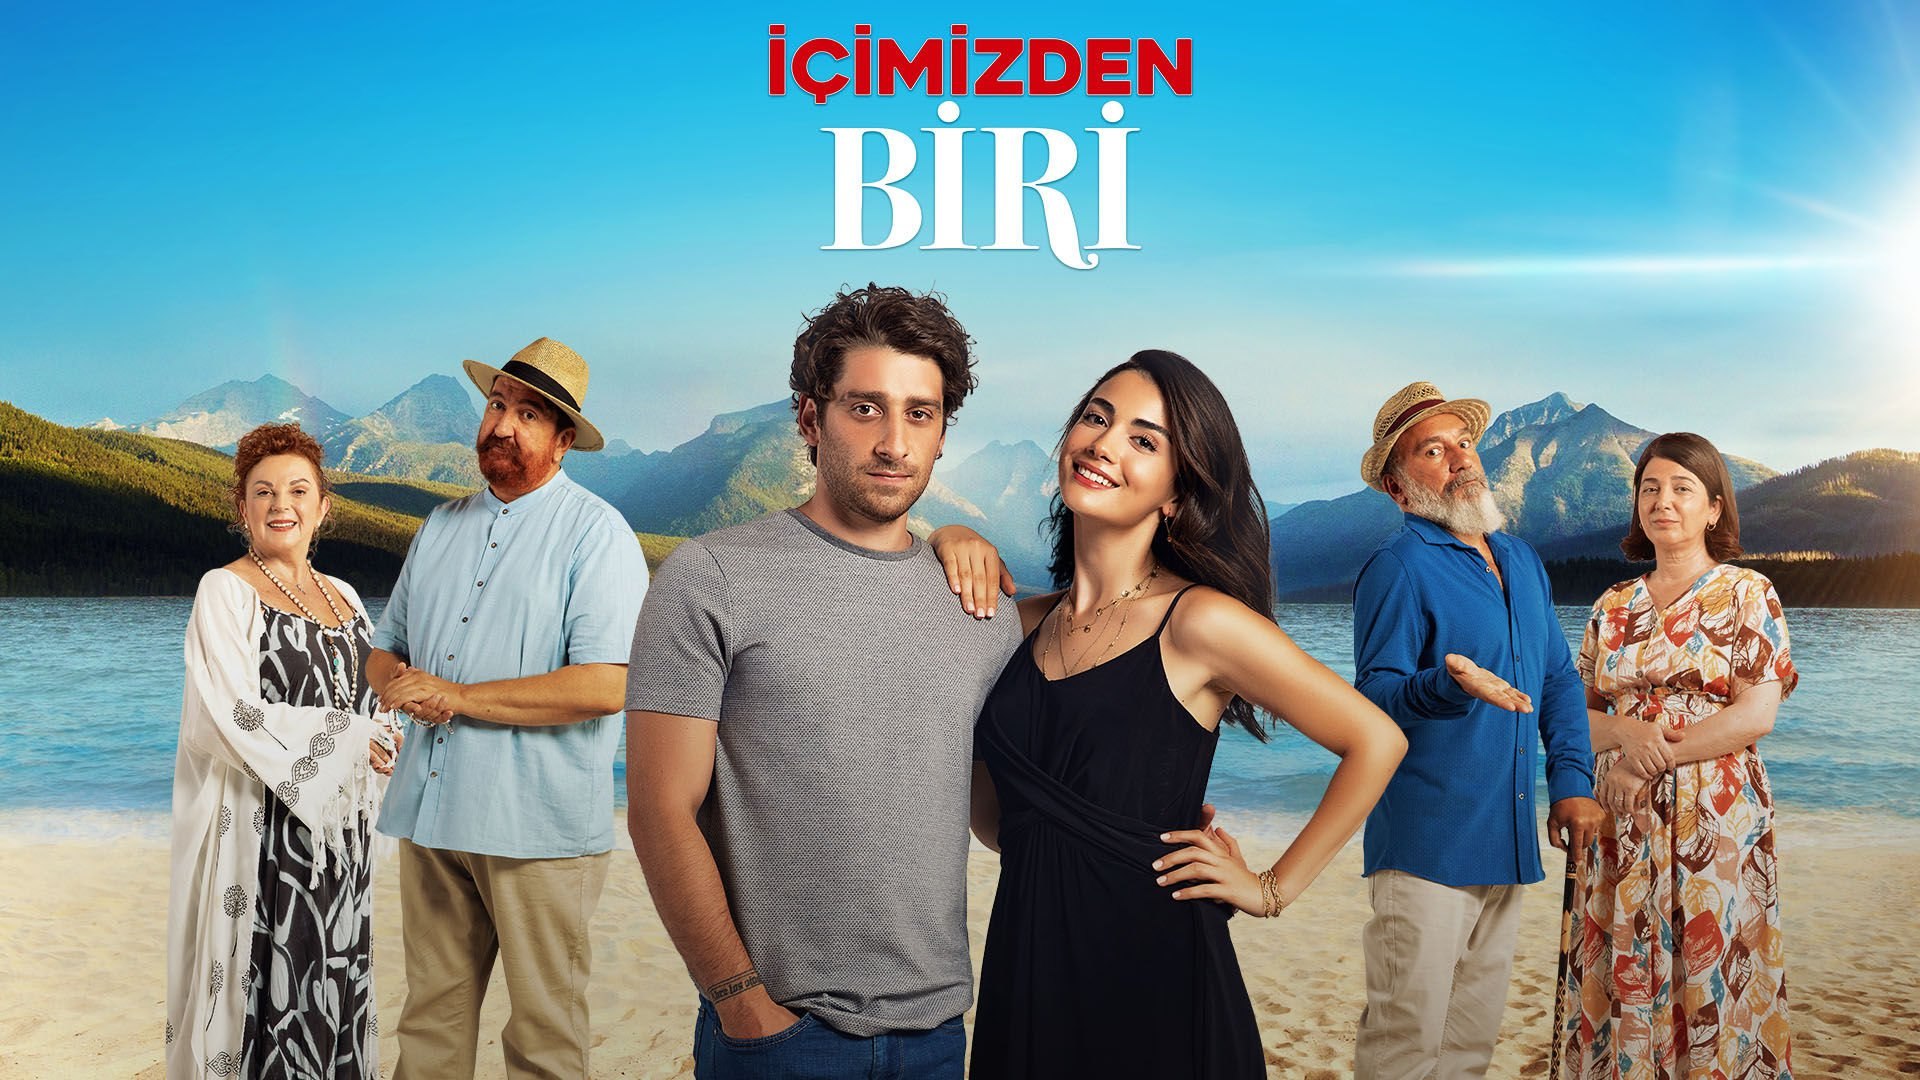 Icimizden Biri (One of Us) is a fresh Turkish romantic comedy